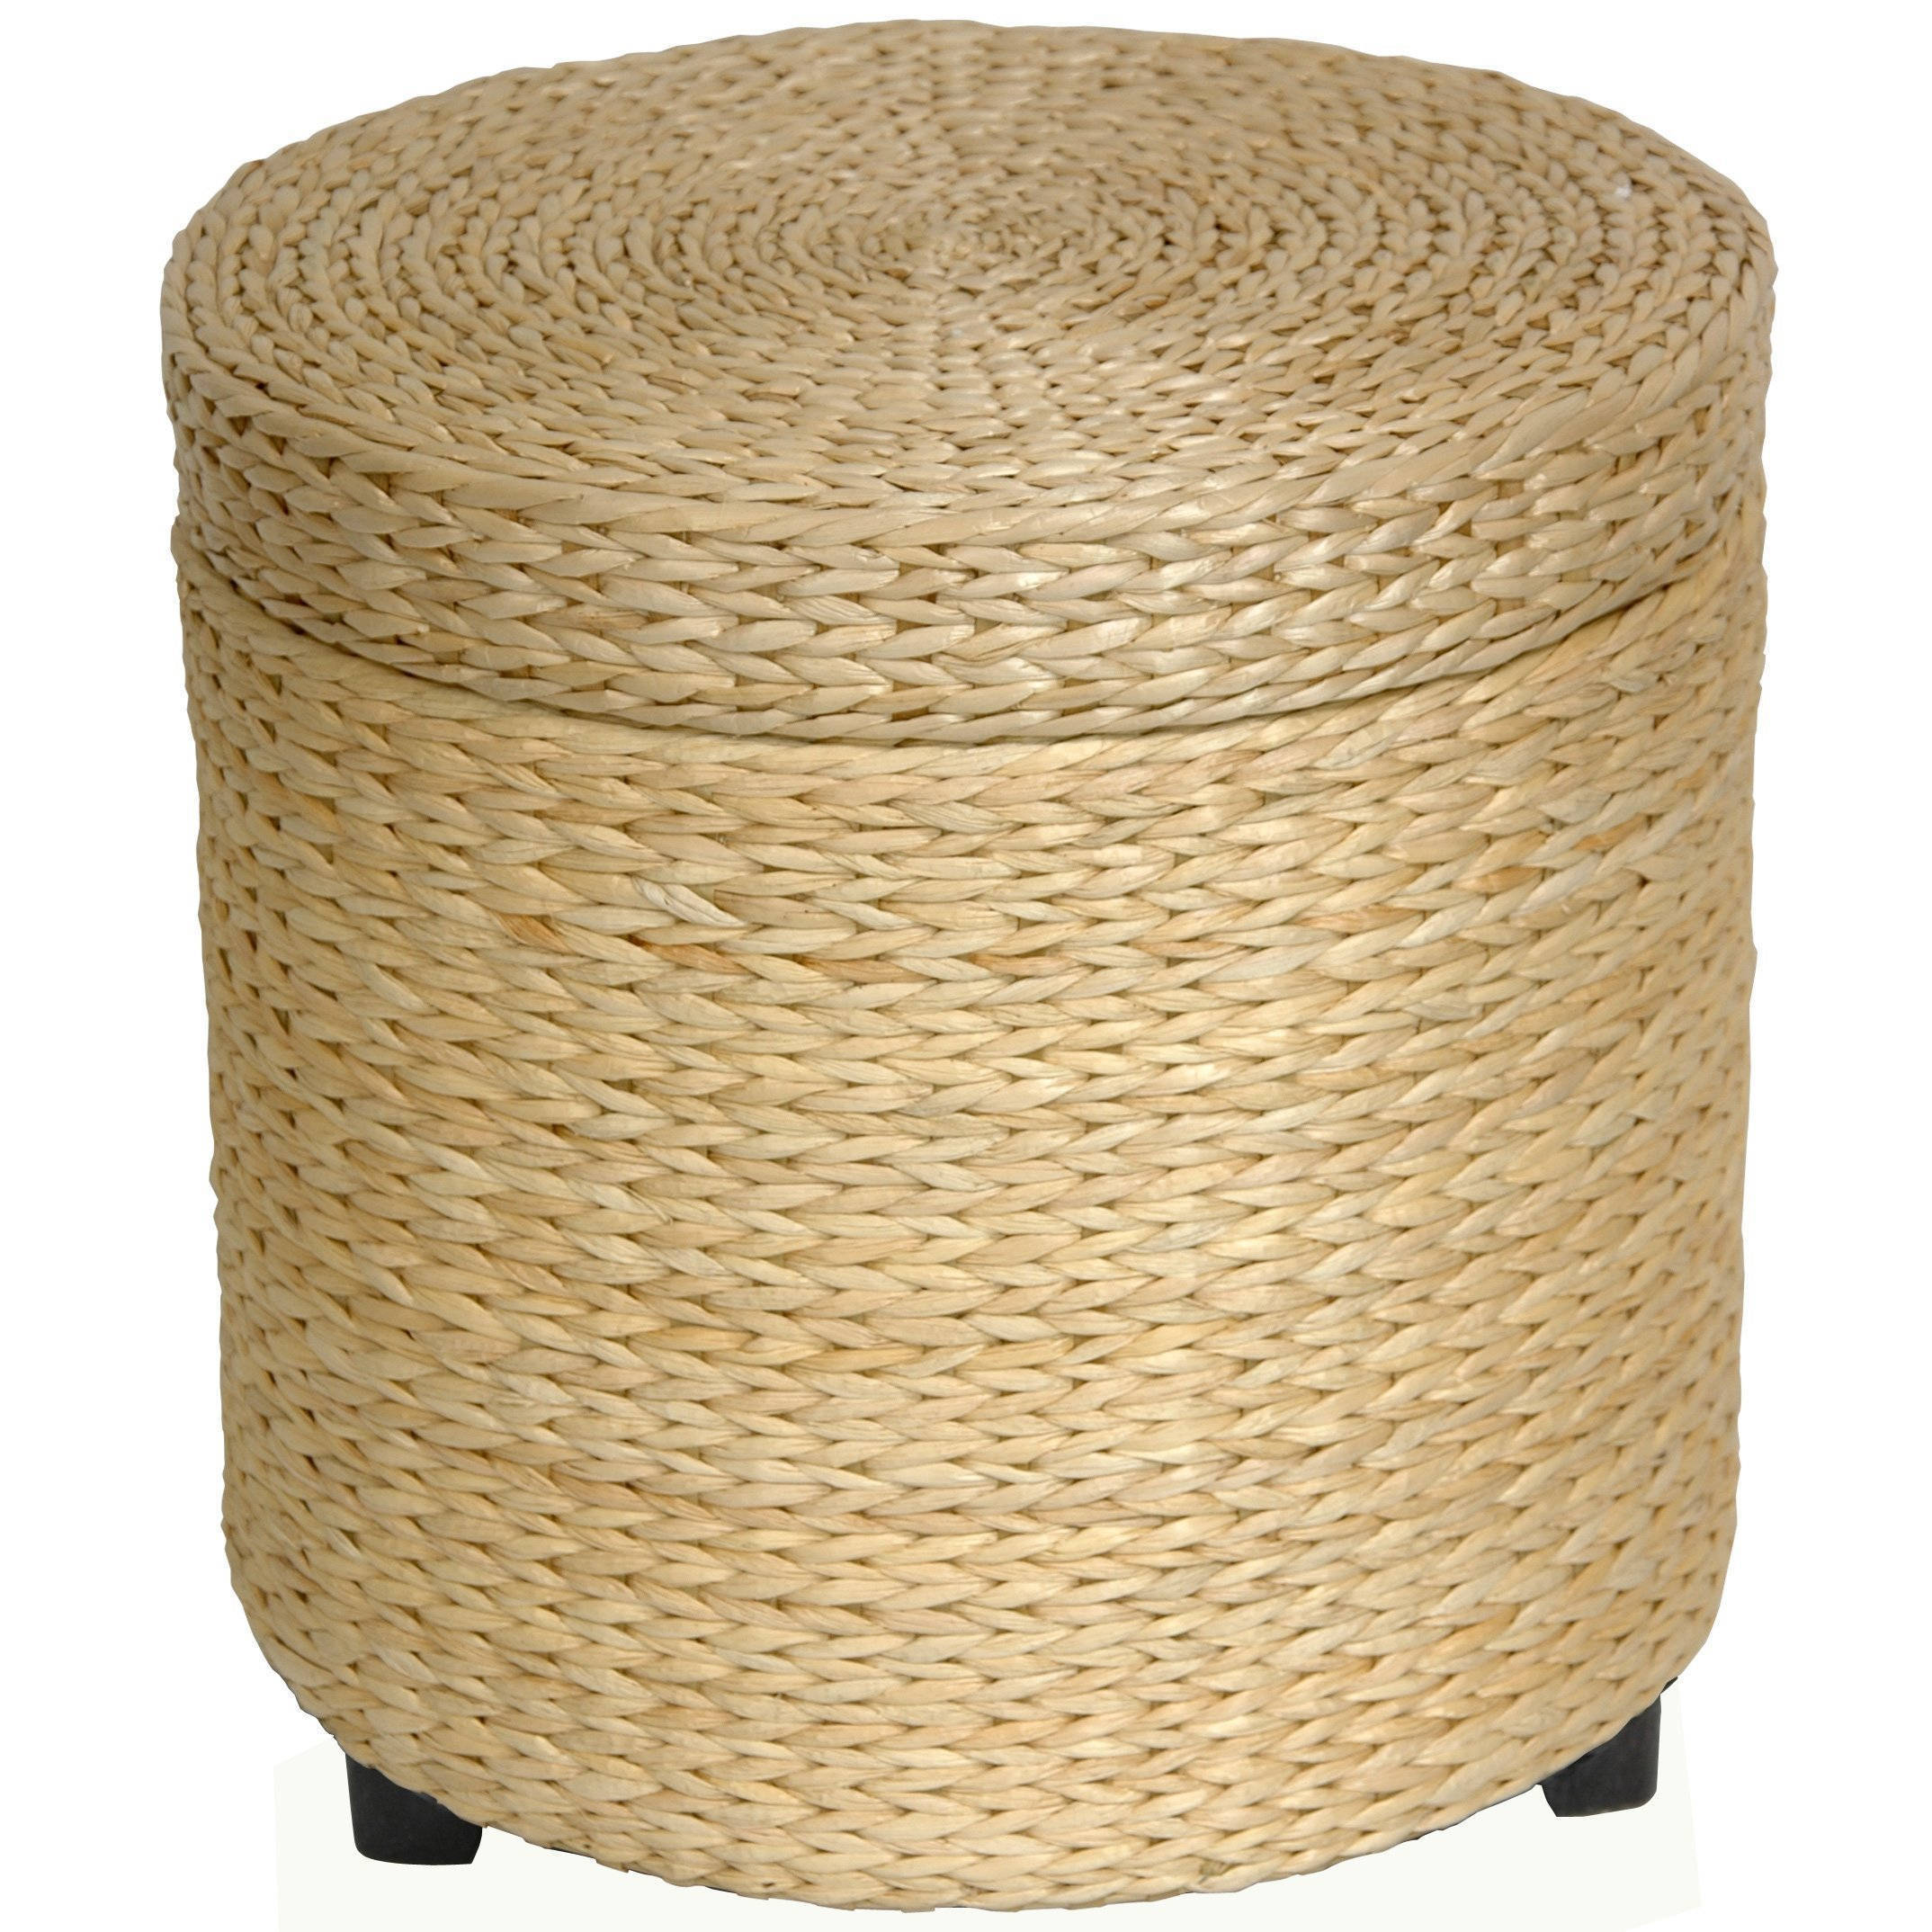 Shop Handmade Rush Grass Storage Footstool (China)   Free Shipping Today    Overstock.com   5085641